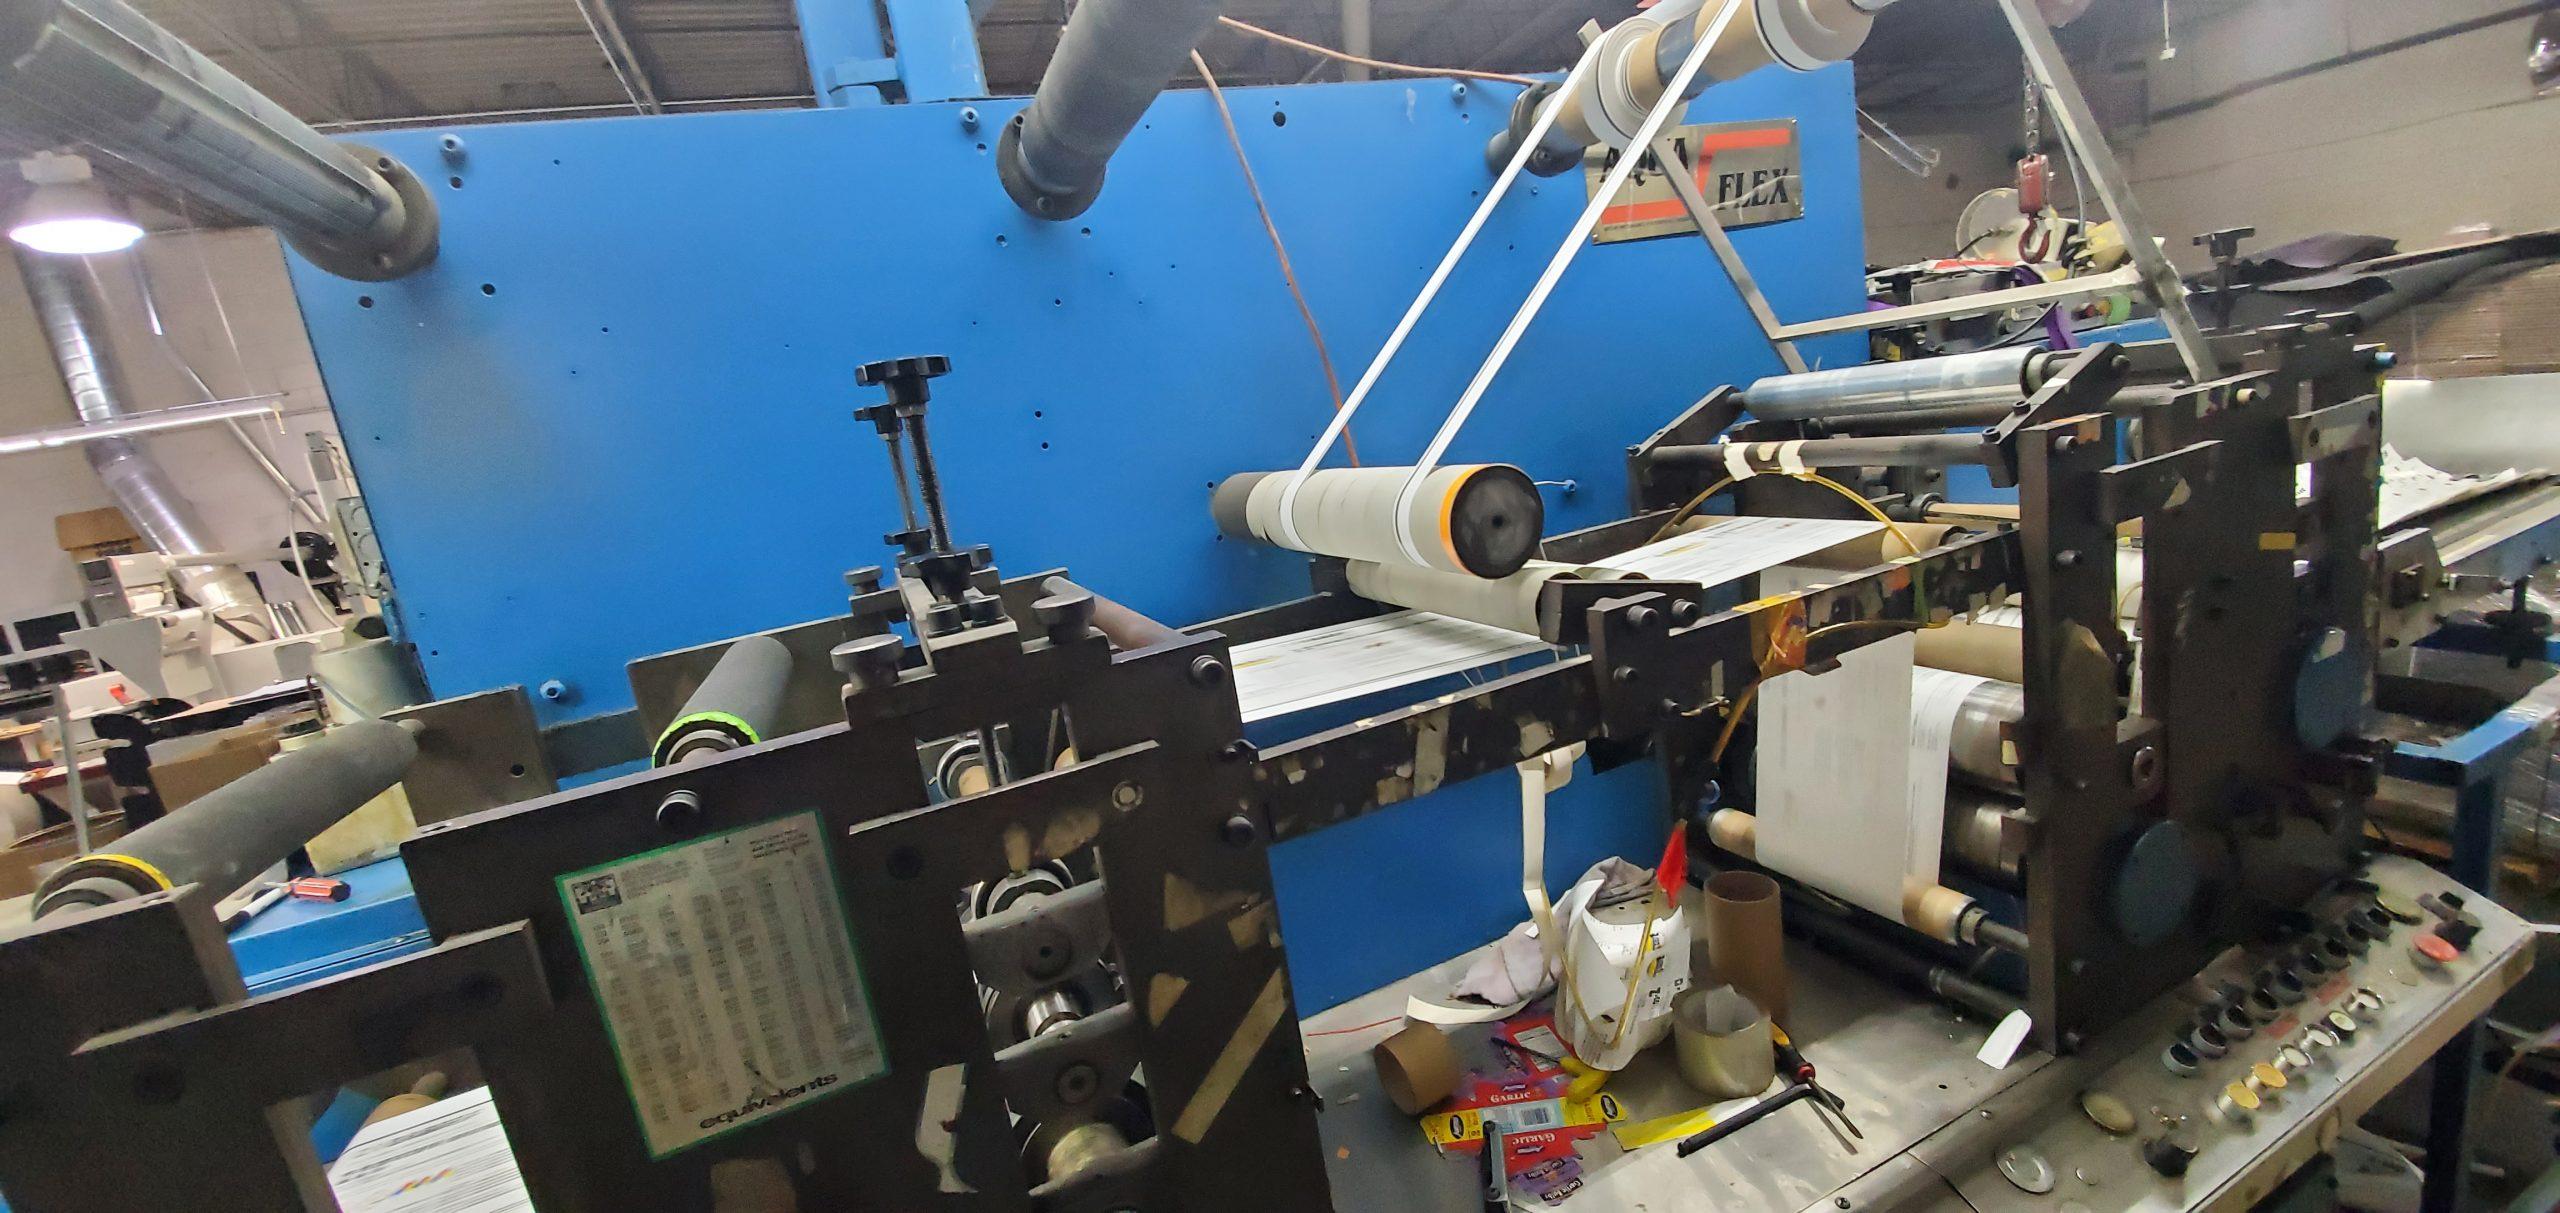 Aquaflex LWSP-1307 - Used Flexo Printing Presses and Used Flexographic Equipment-5